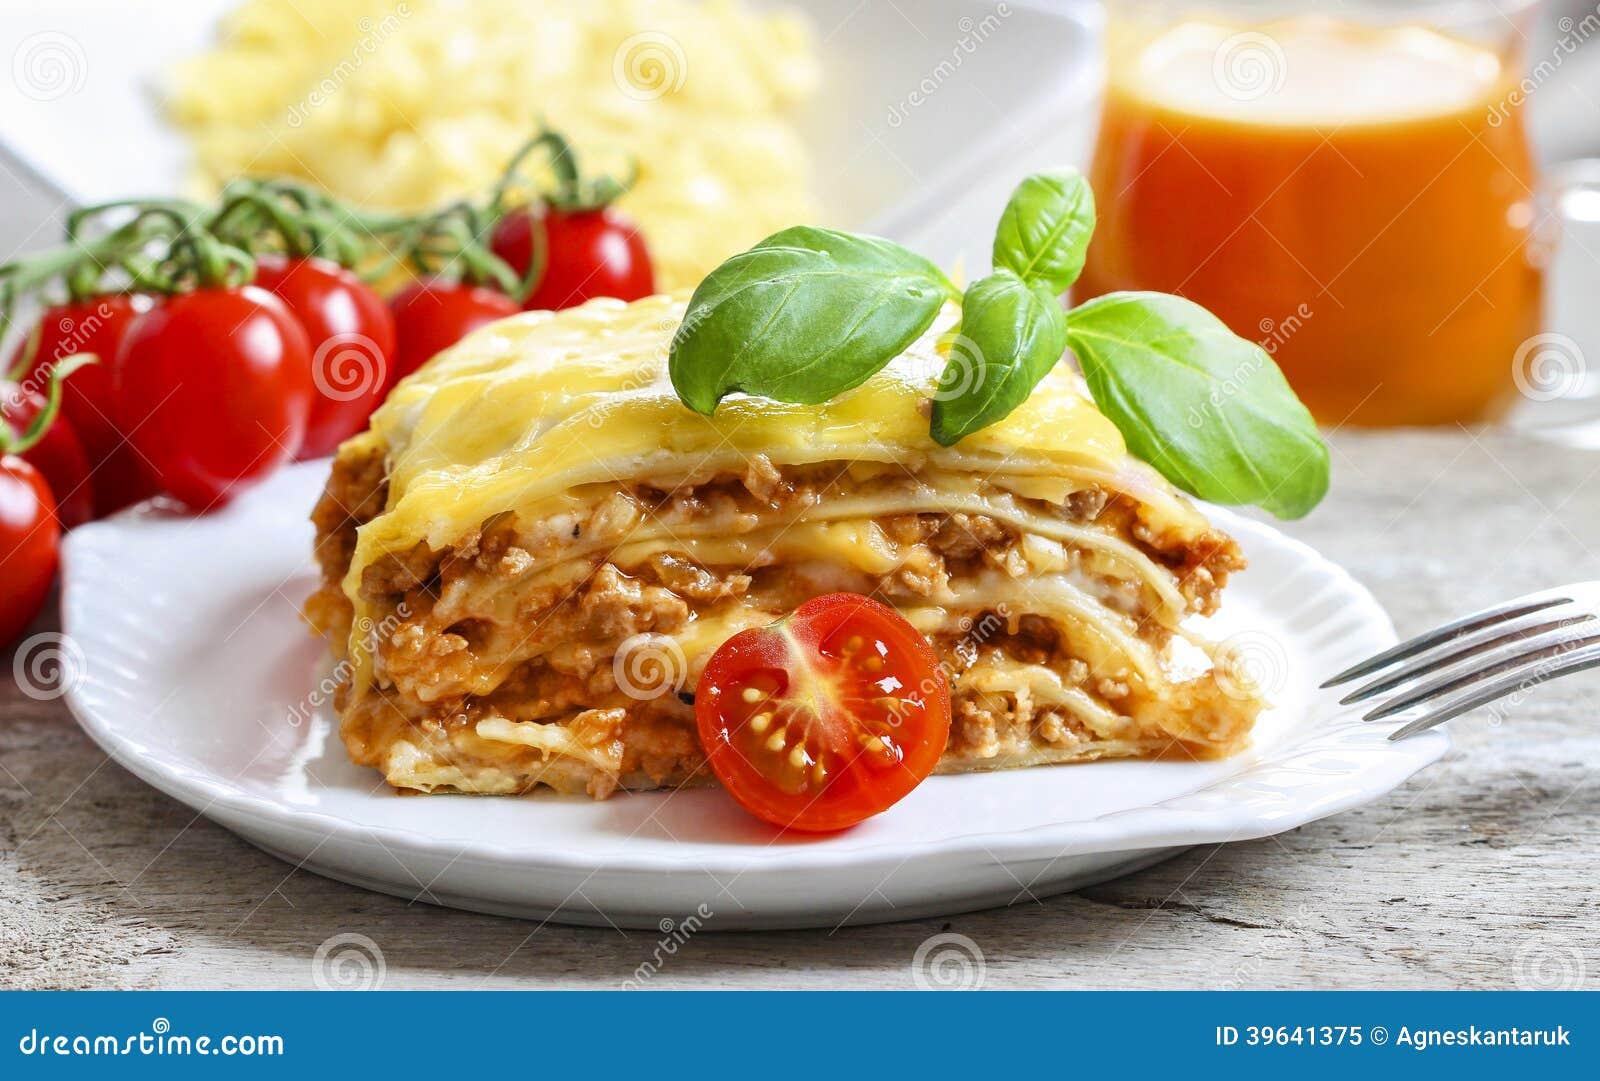 lasagne plat italien traditionnel photo stock image 39641375. Black Bedroom Furniture Sets. Home Design Ideas